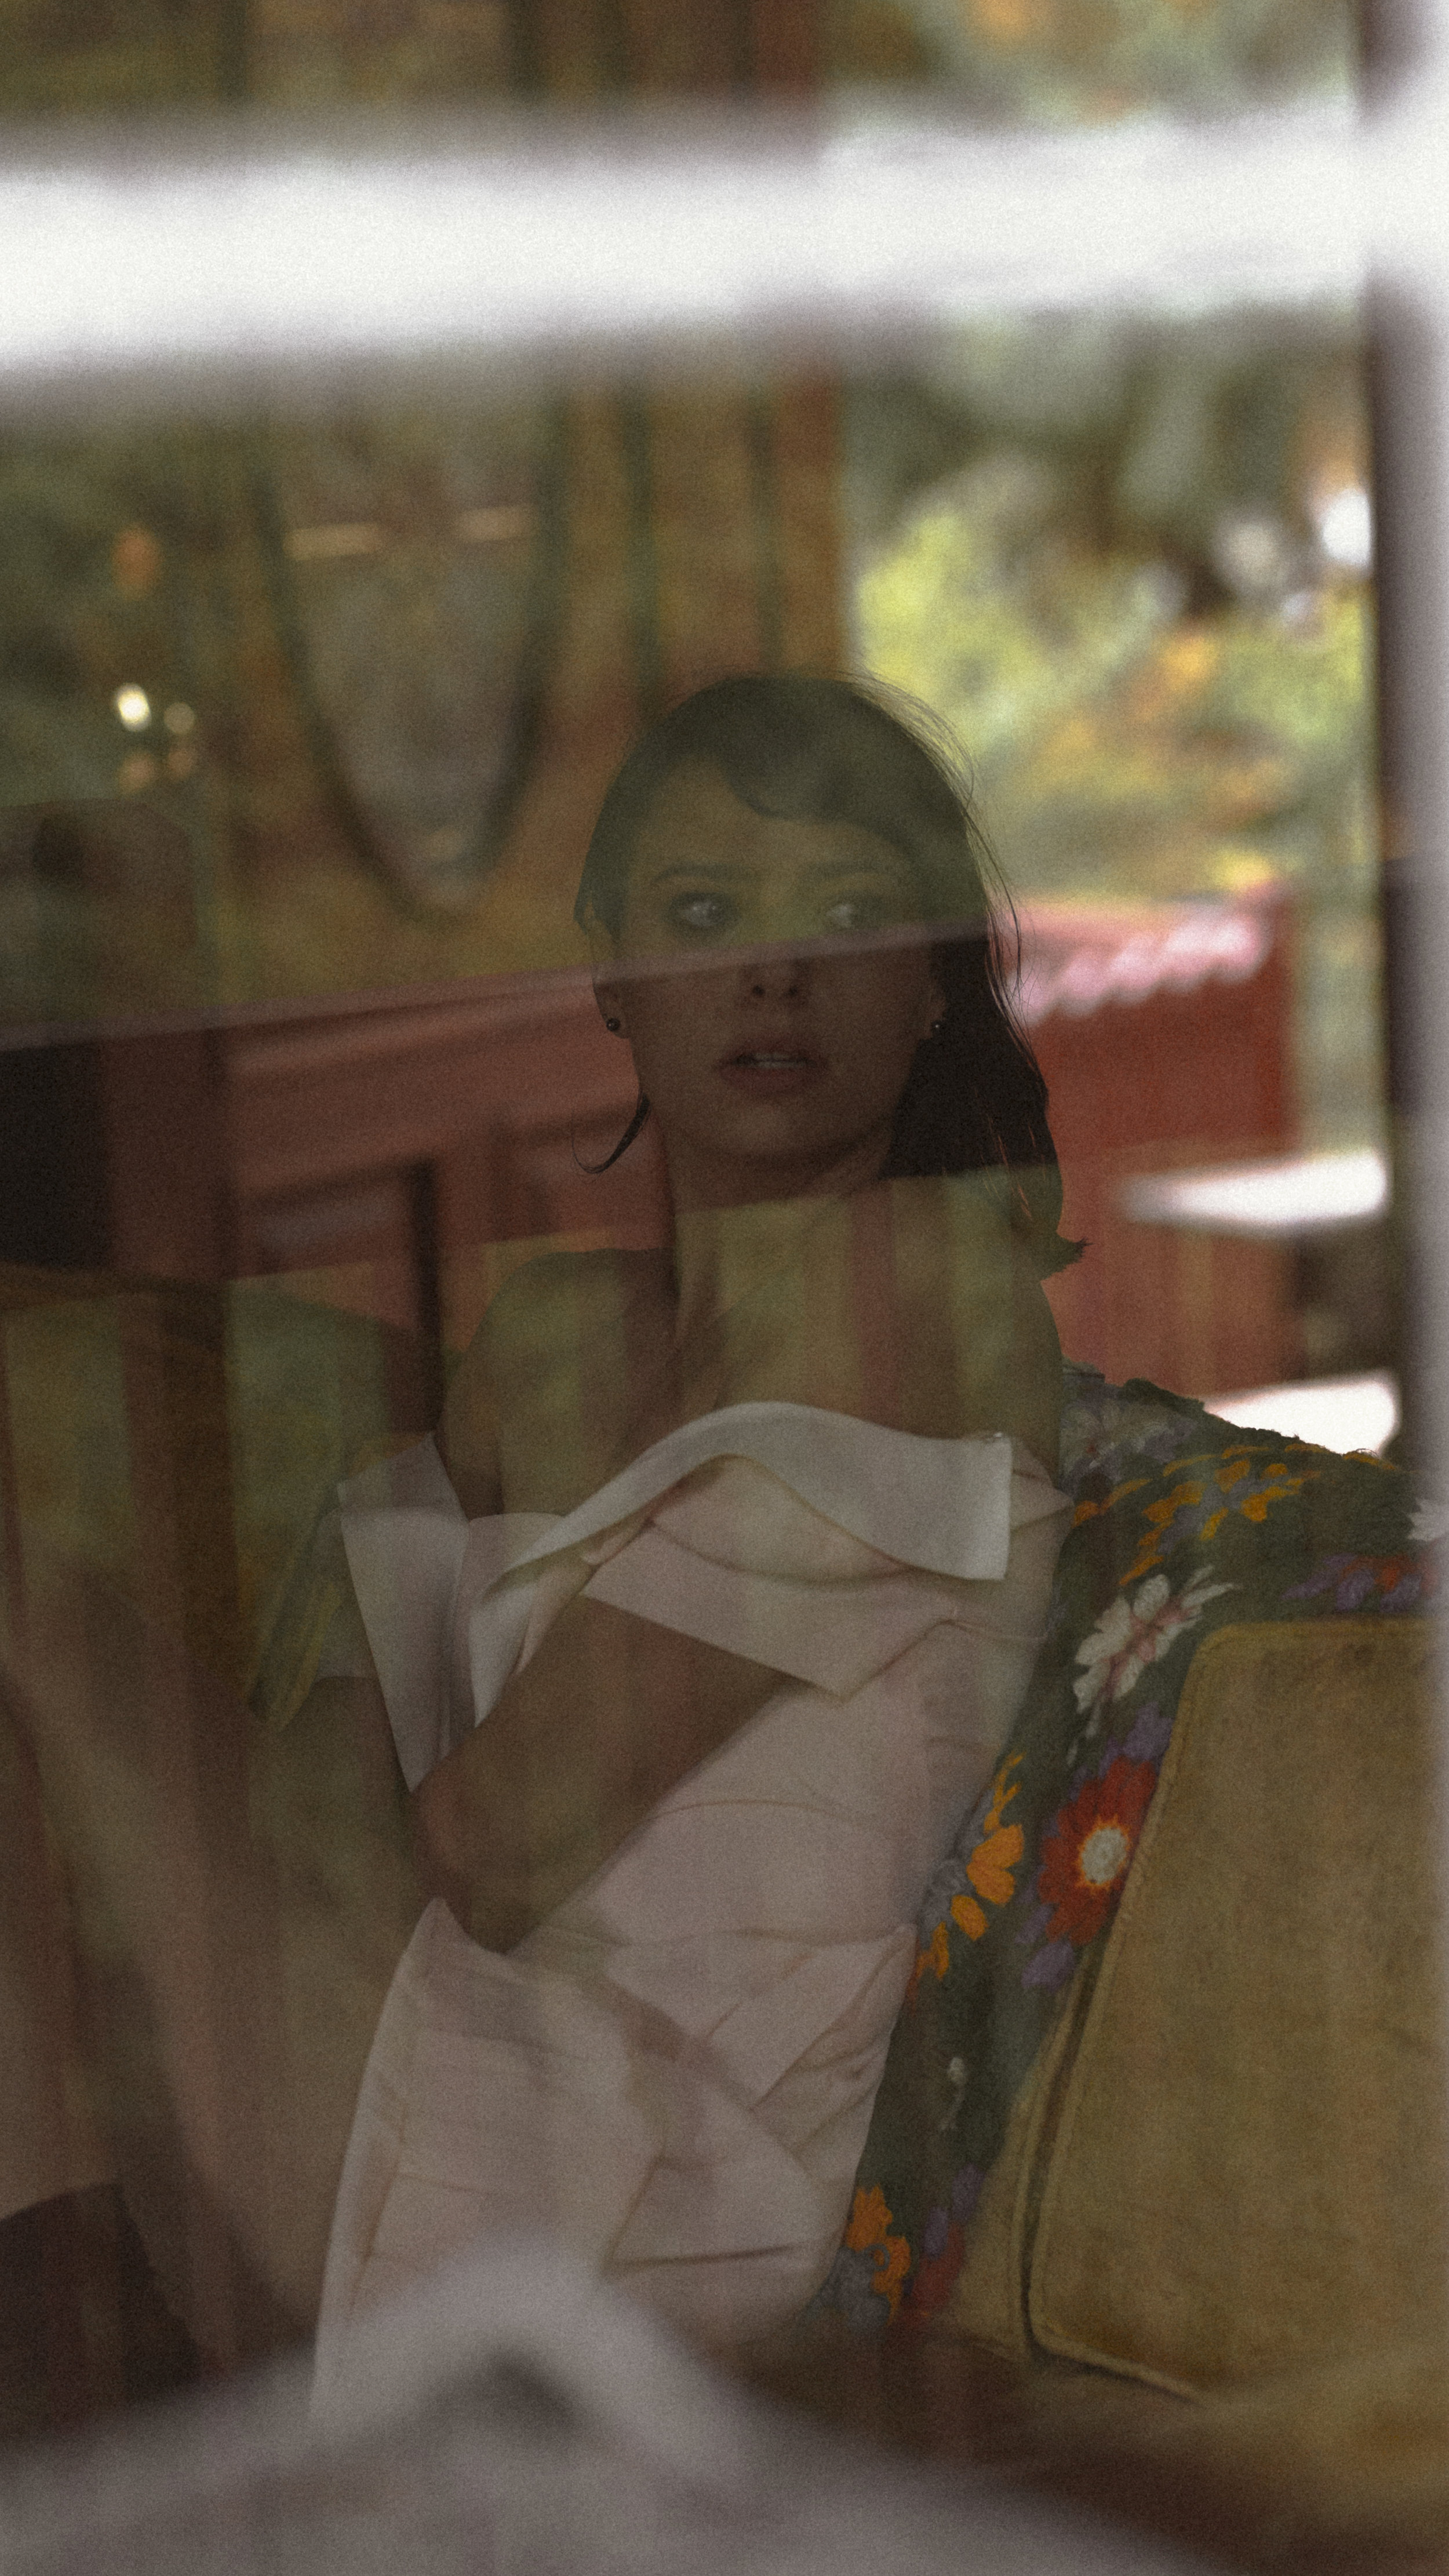 MandeeRae_SeattlePhotographerArtshow_PinkSet_Windows_1.jpg